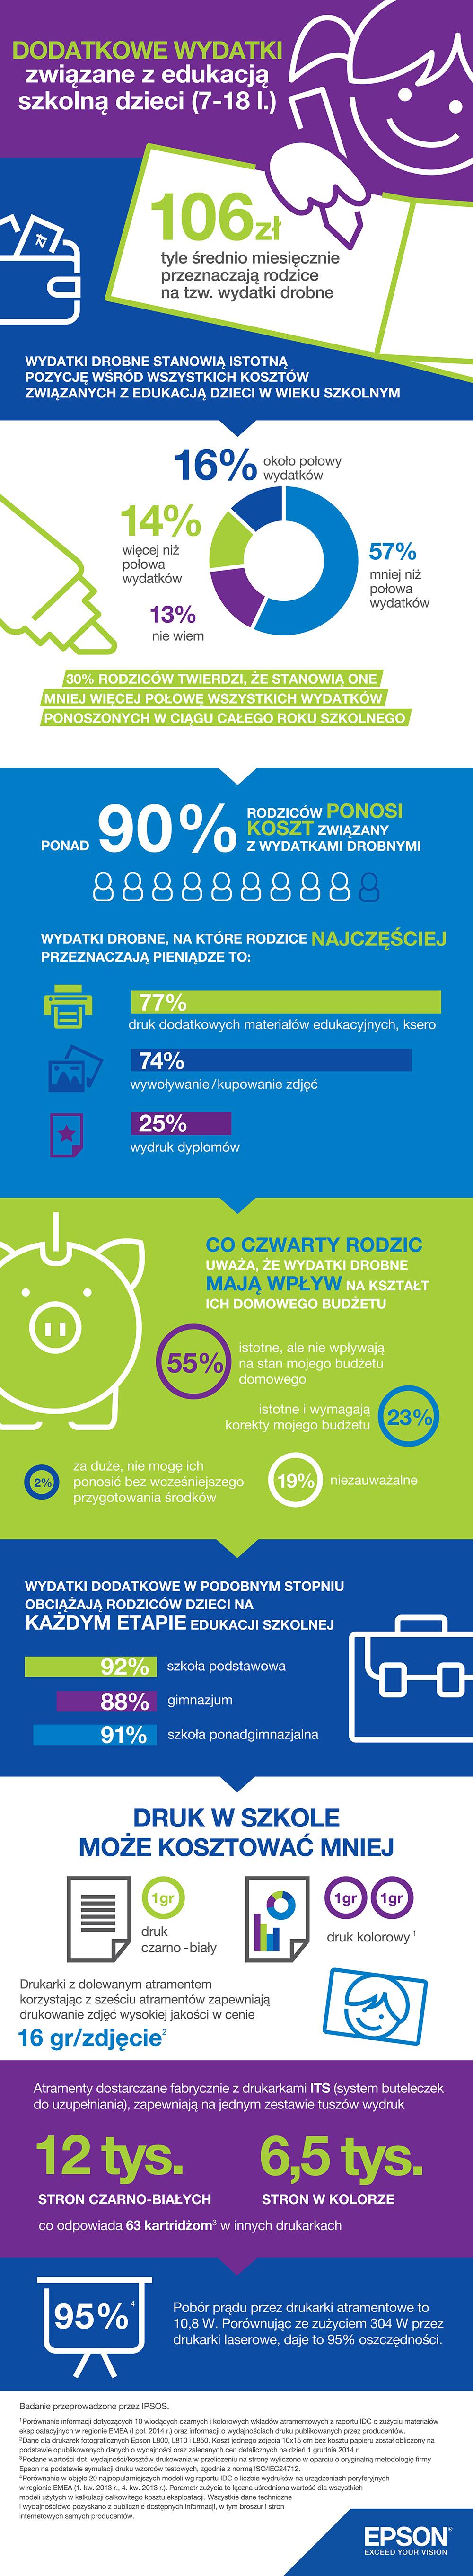 epson_infografika wydatki drobne.jpg